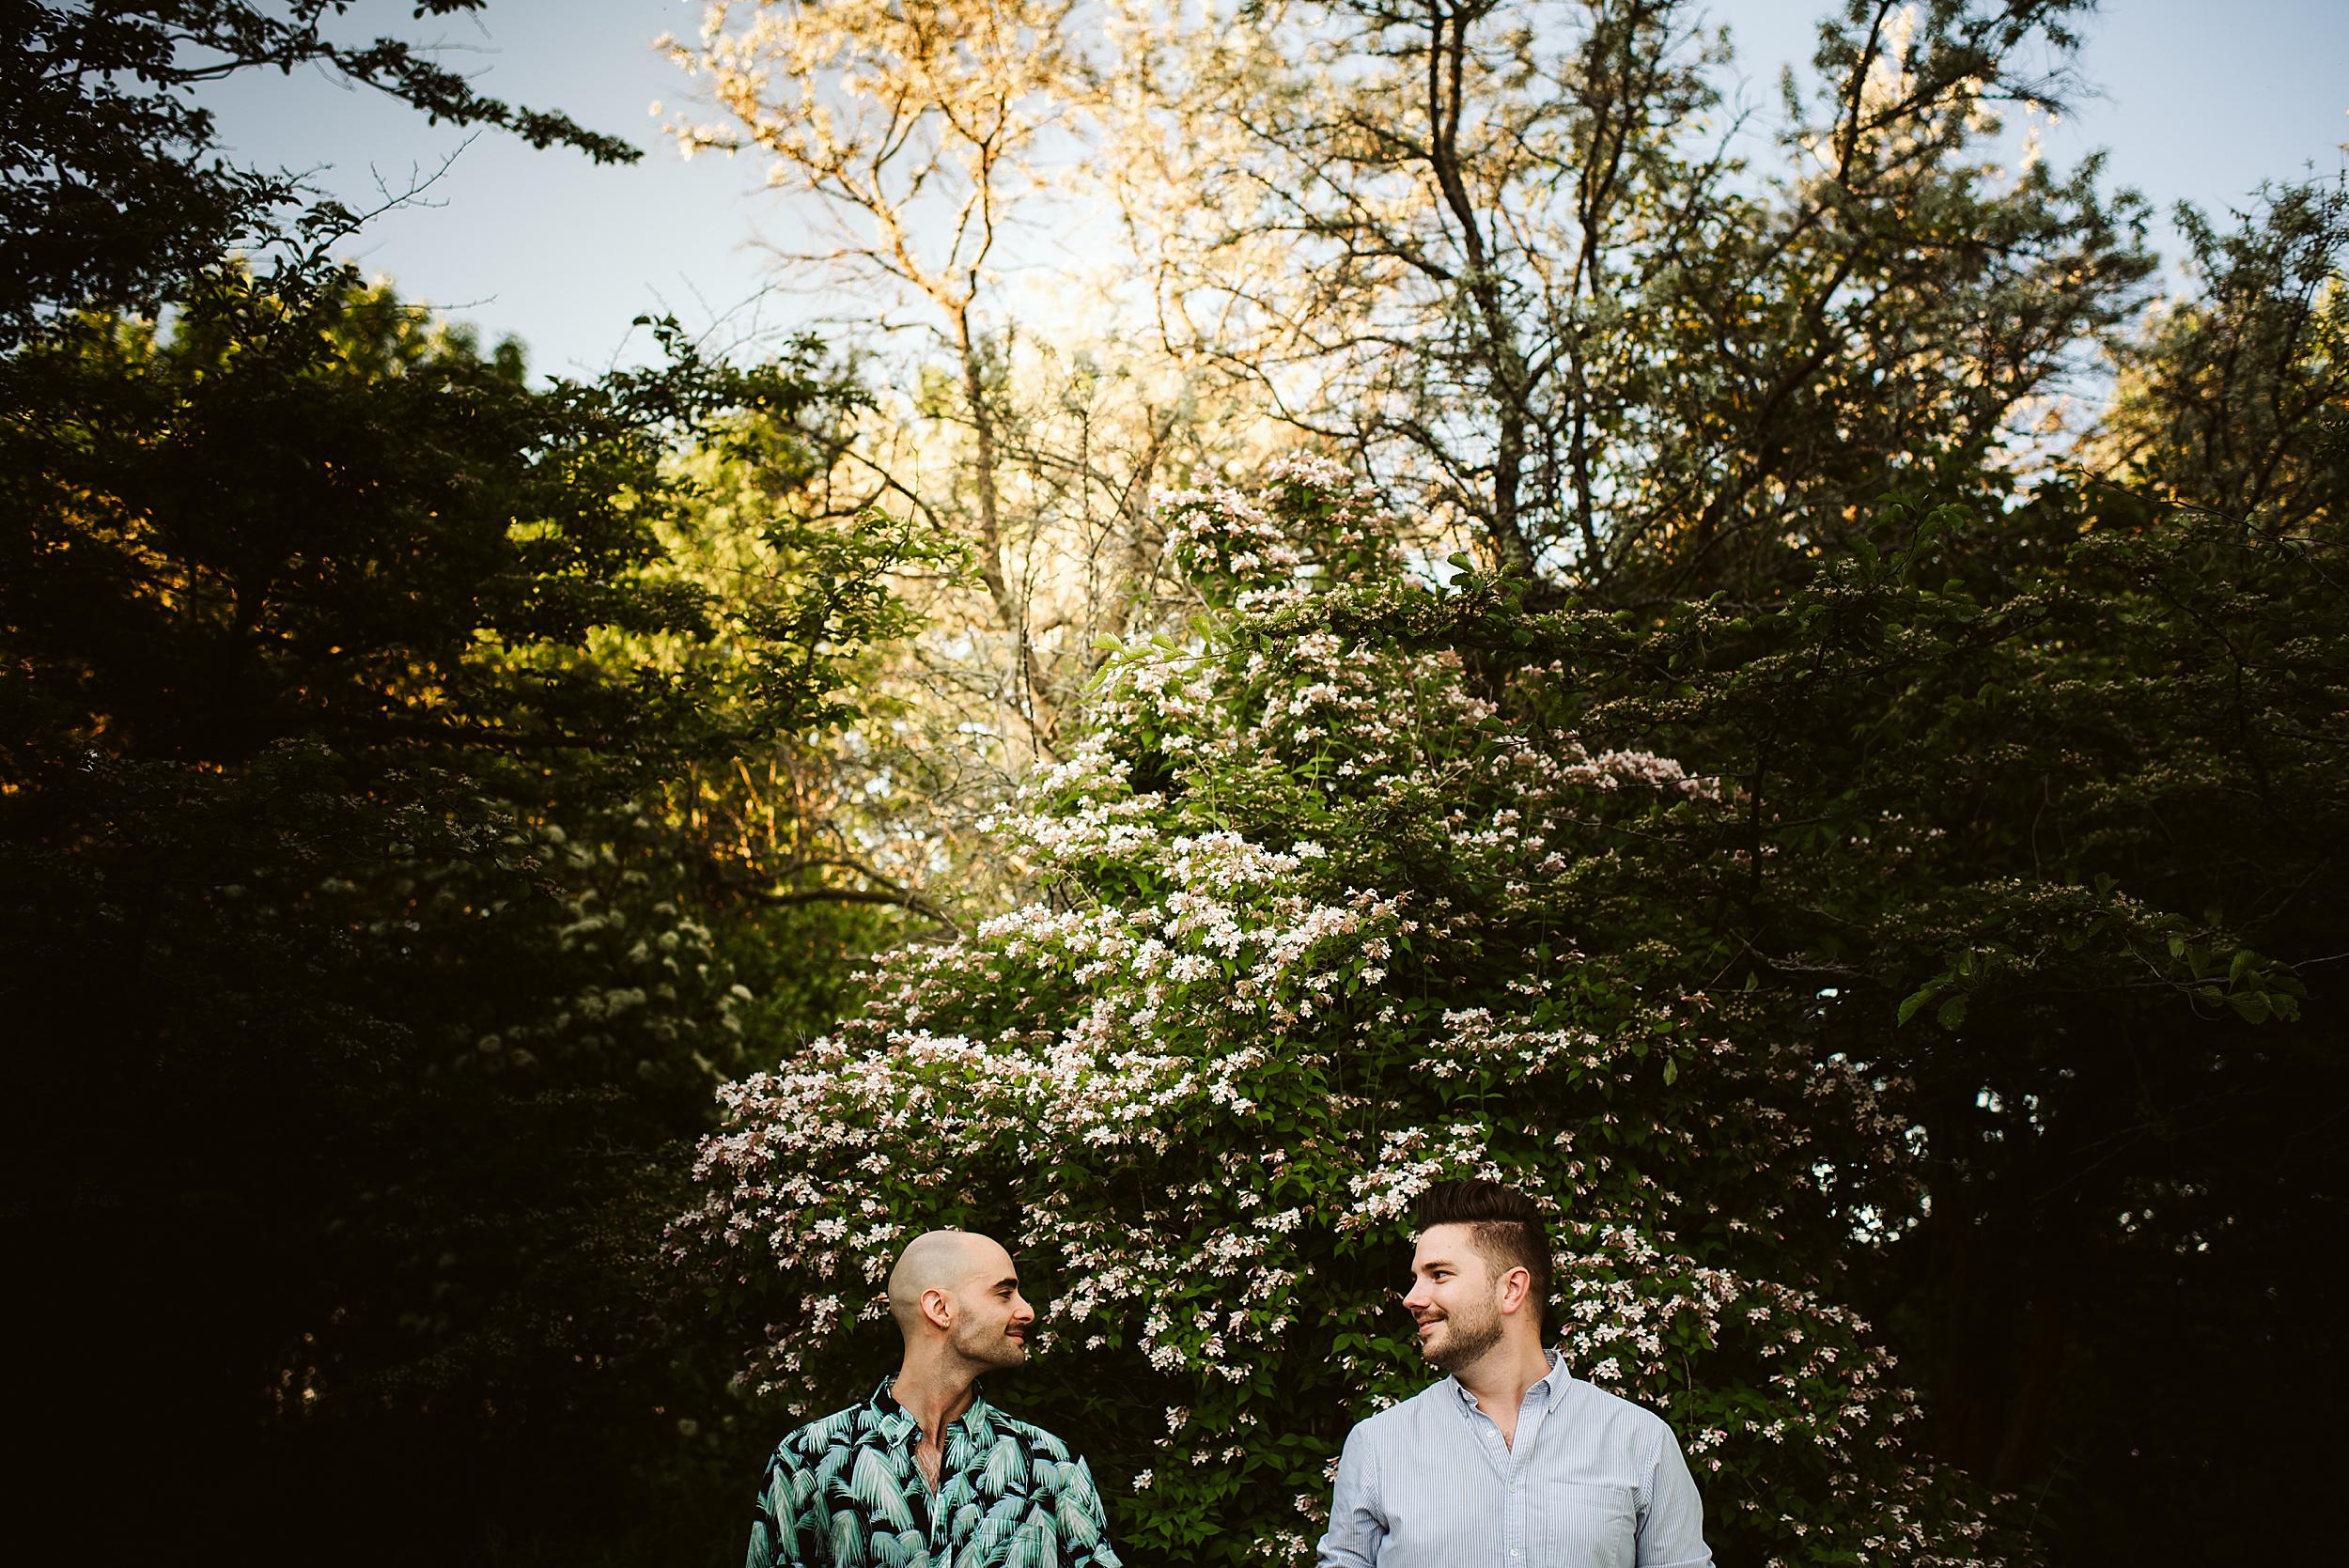 Toronto-Wedding-Photographers-Engagement-Shoot-Woodbine-Bay-Ashbridges-Bay_0015.jpg